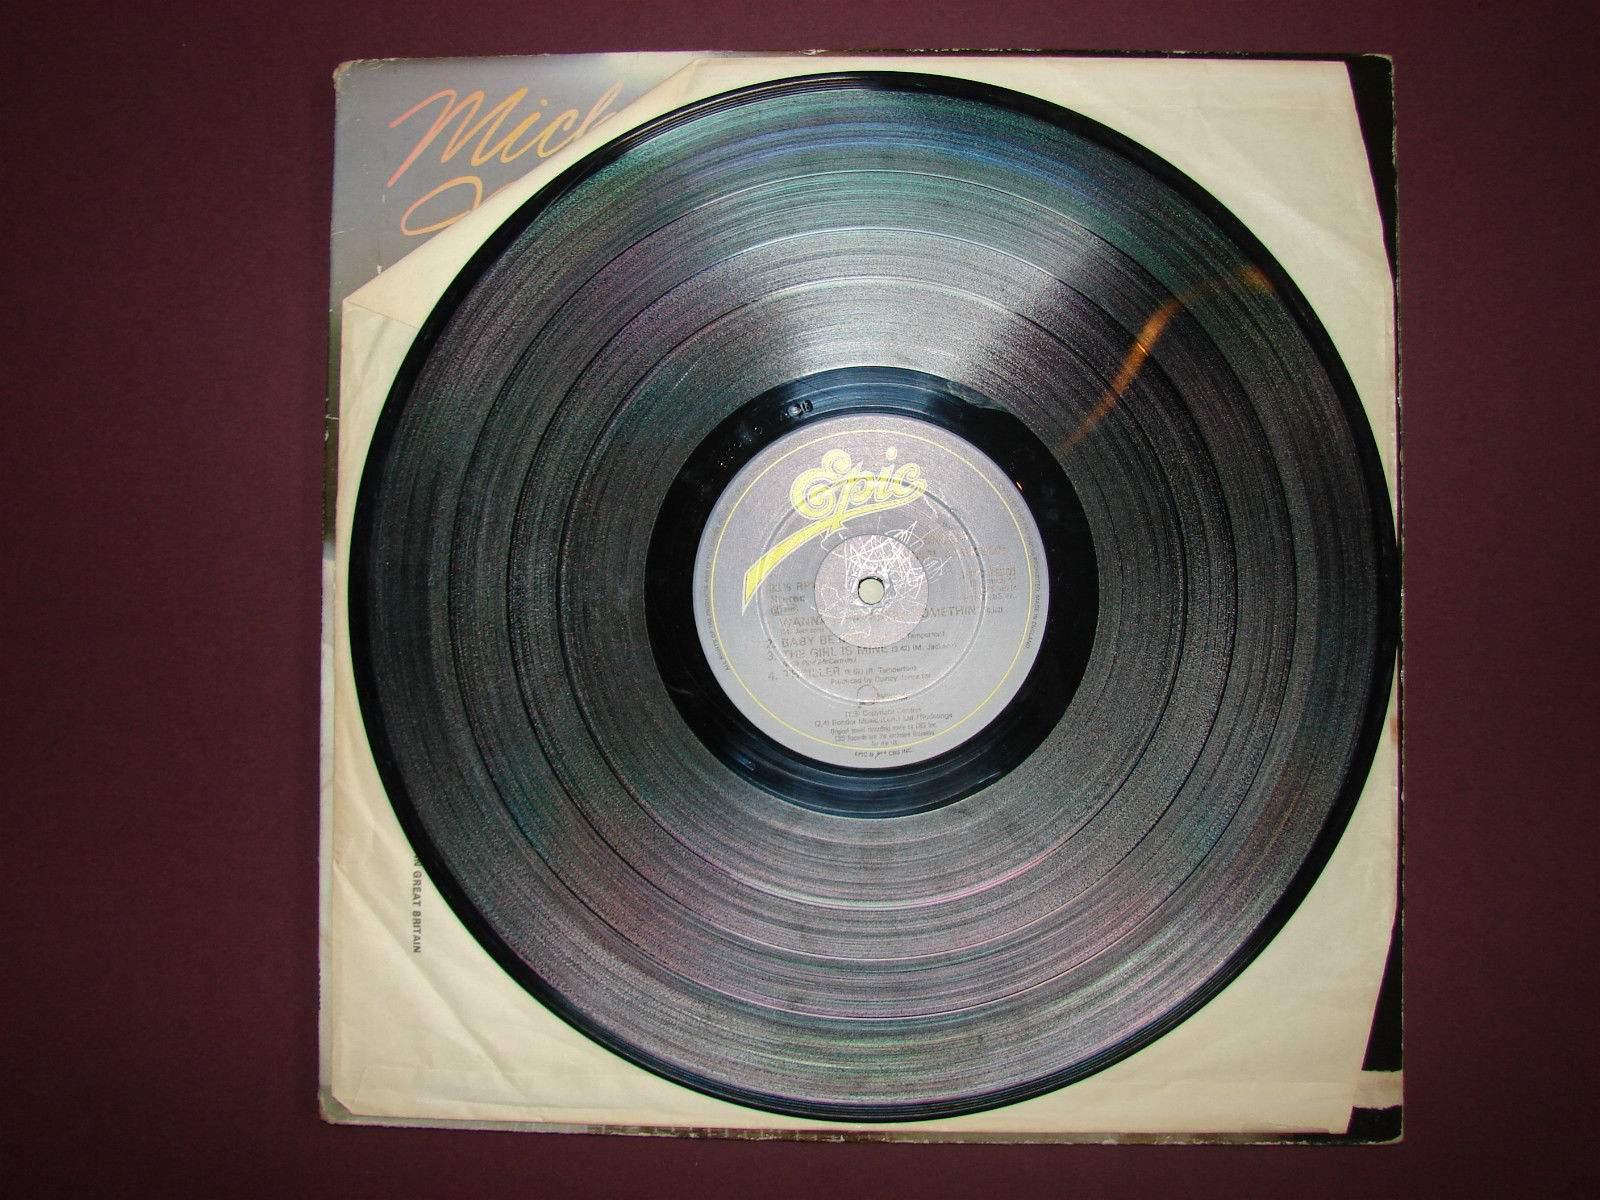 Michael Jackson Thriller Gatefold Lp Vinyl Record 1982 57